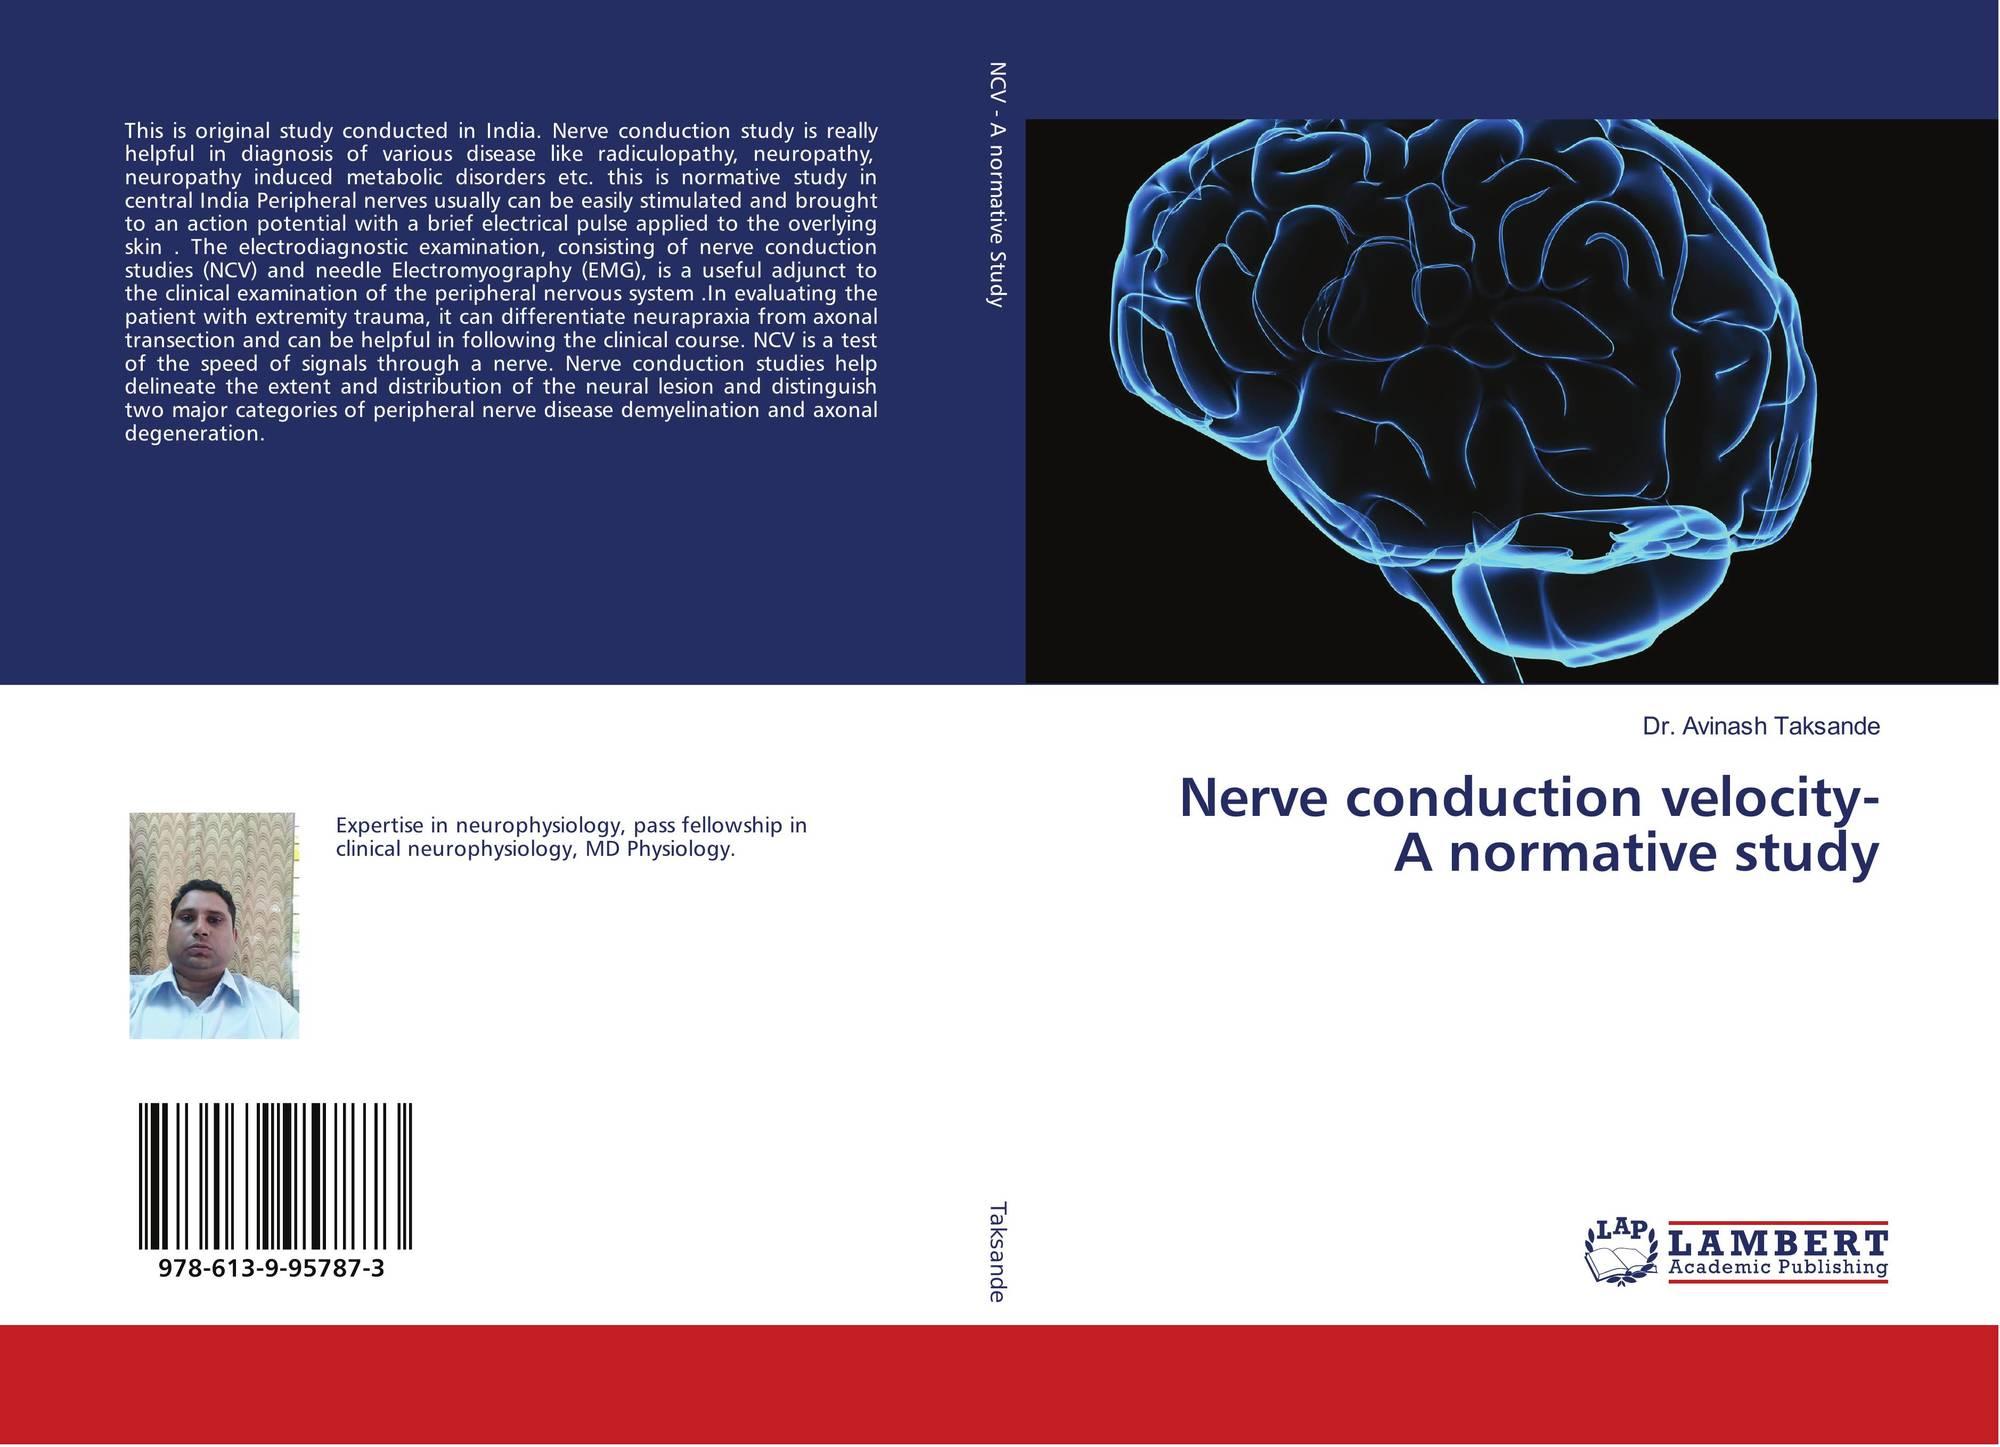 Nerve conduction velocity- A normative study, 978-613-9-95787-3